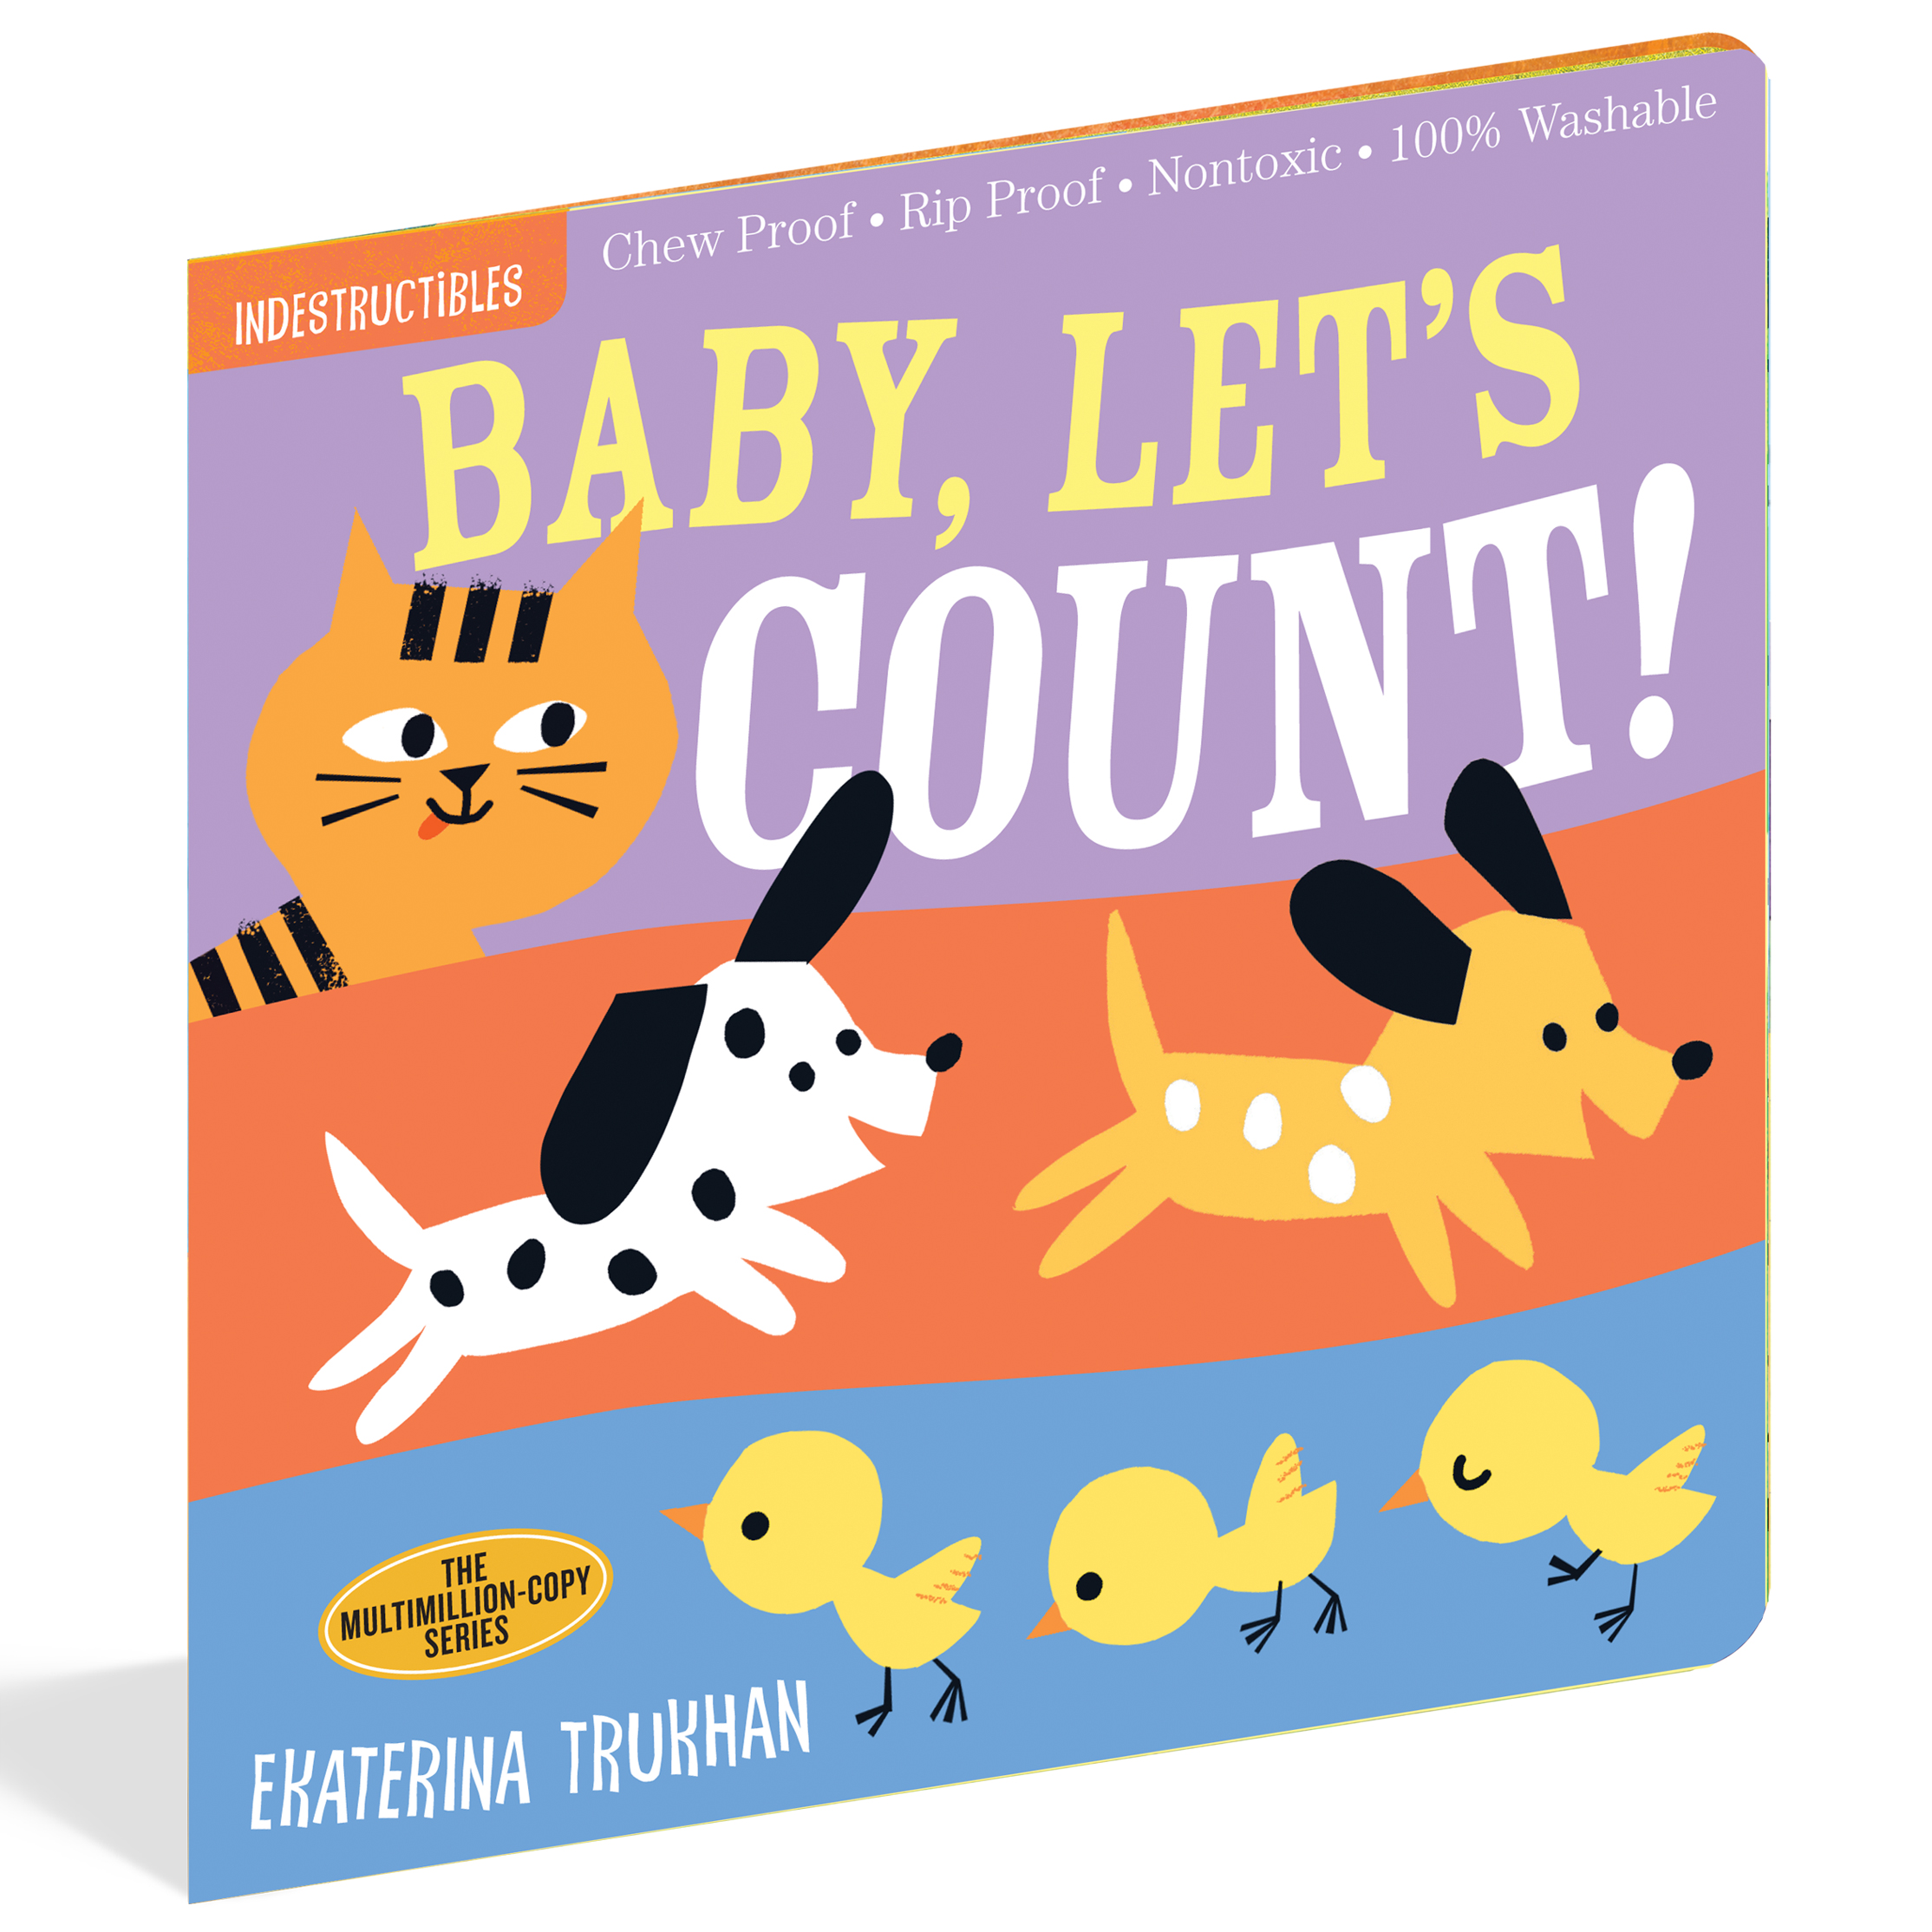 Indestructibles: Baby, Let's Count! 1